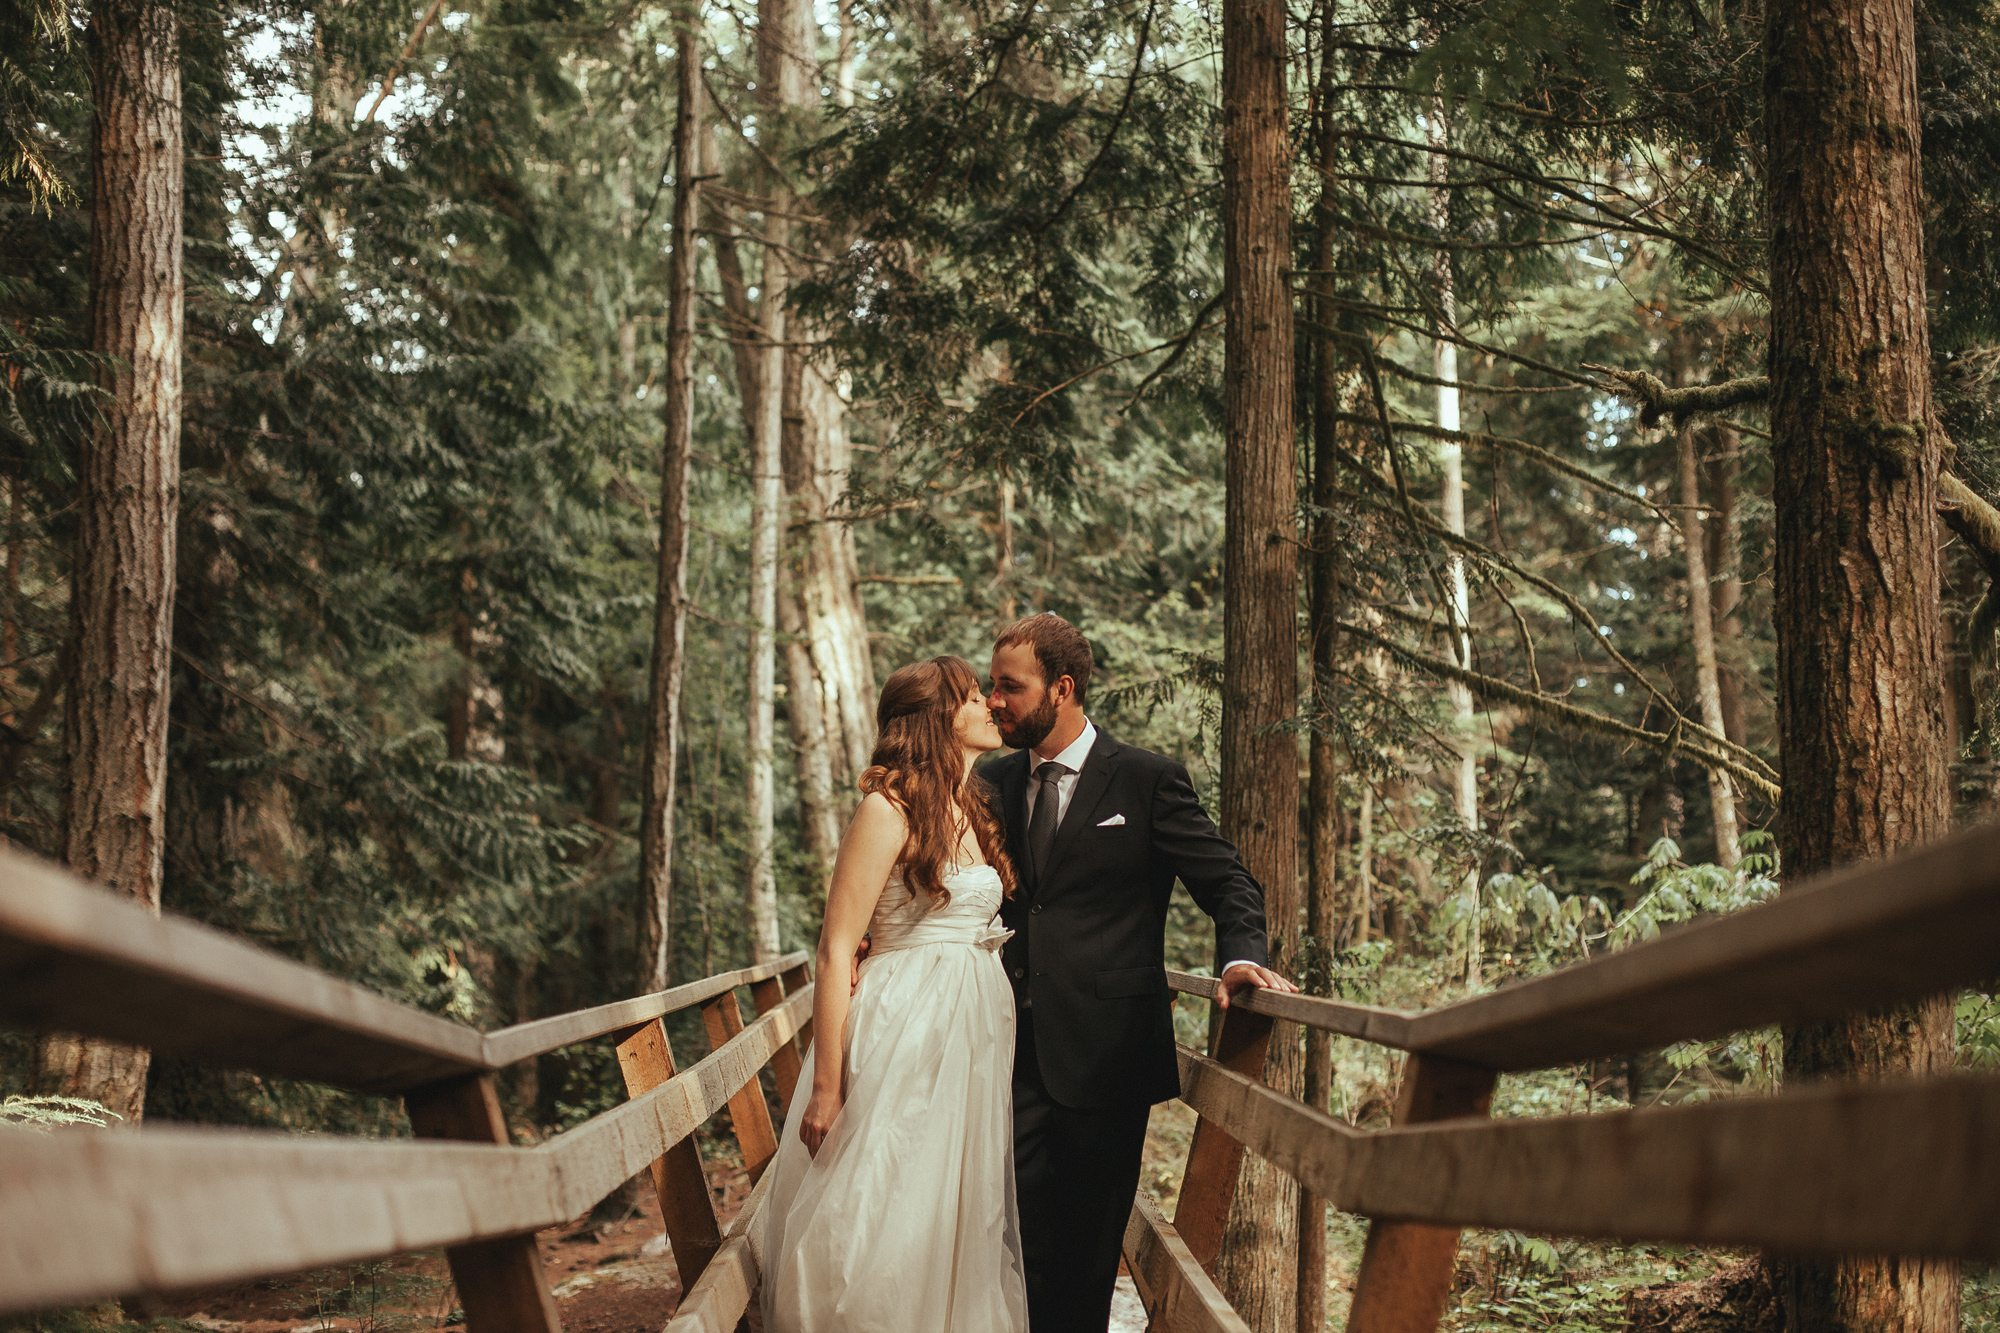 gibsons-wedding-photography-robert-devon39